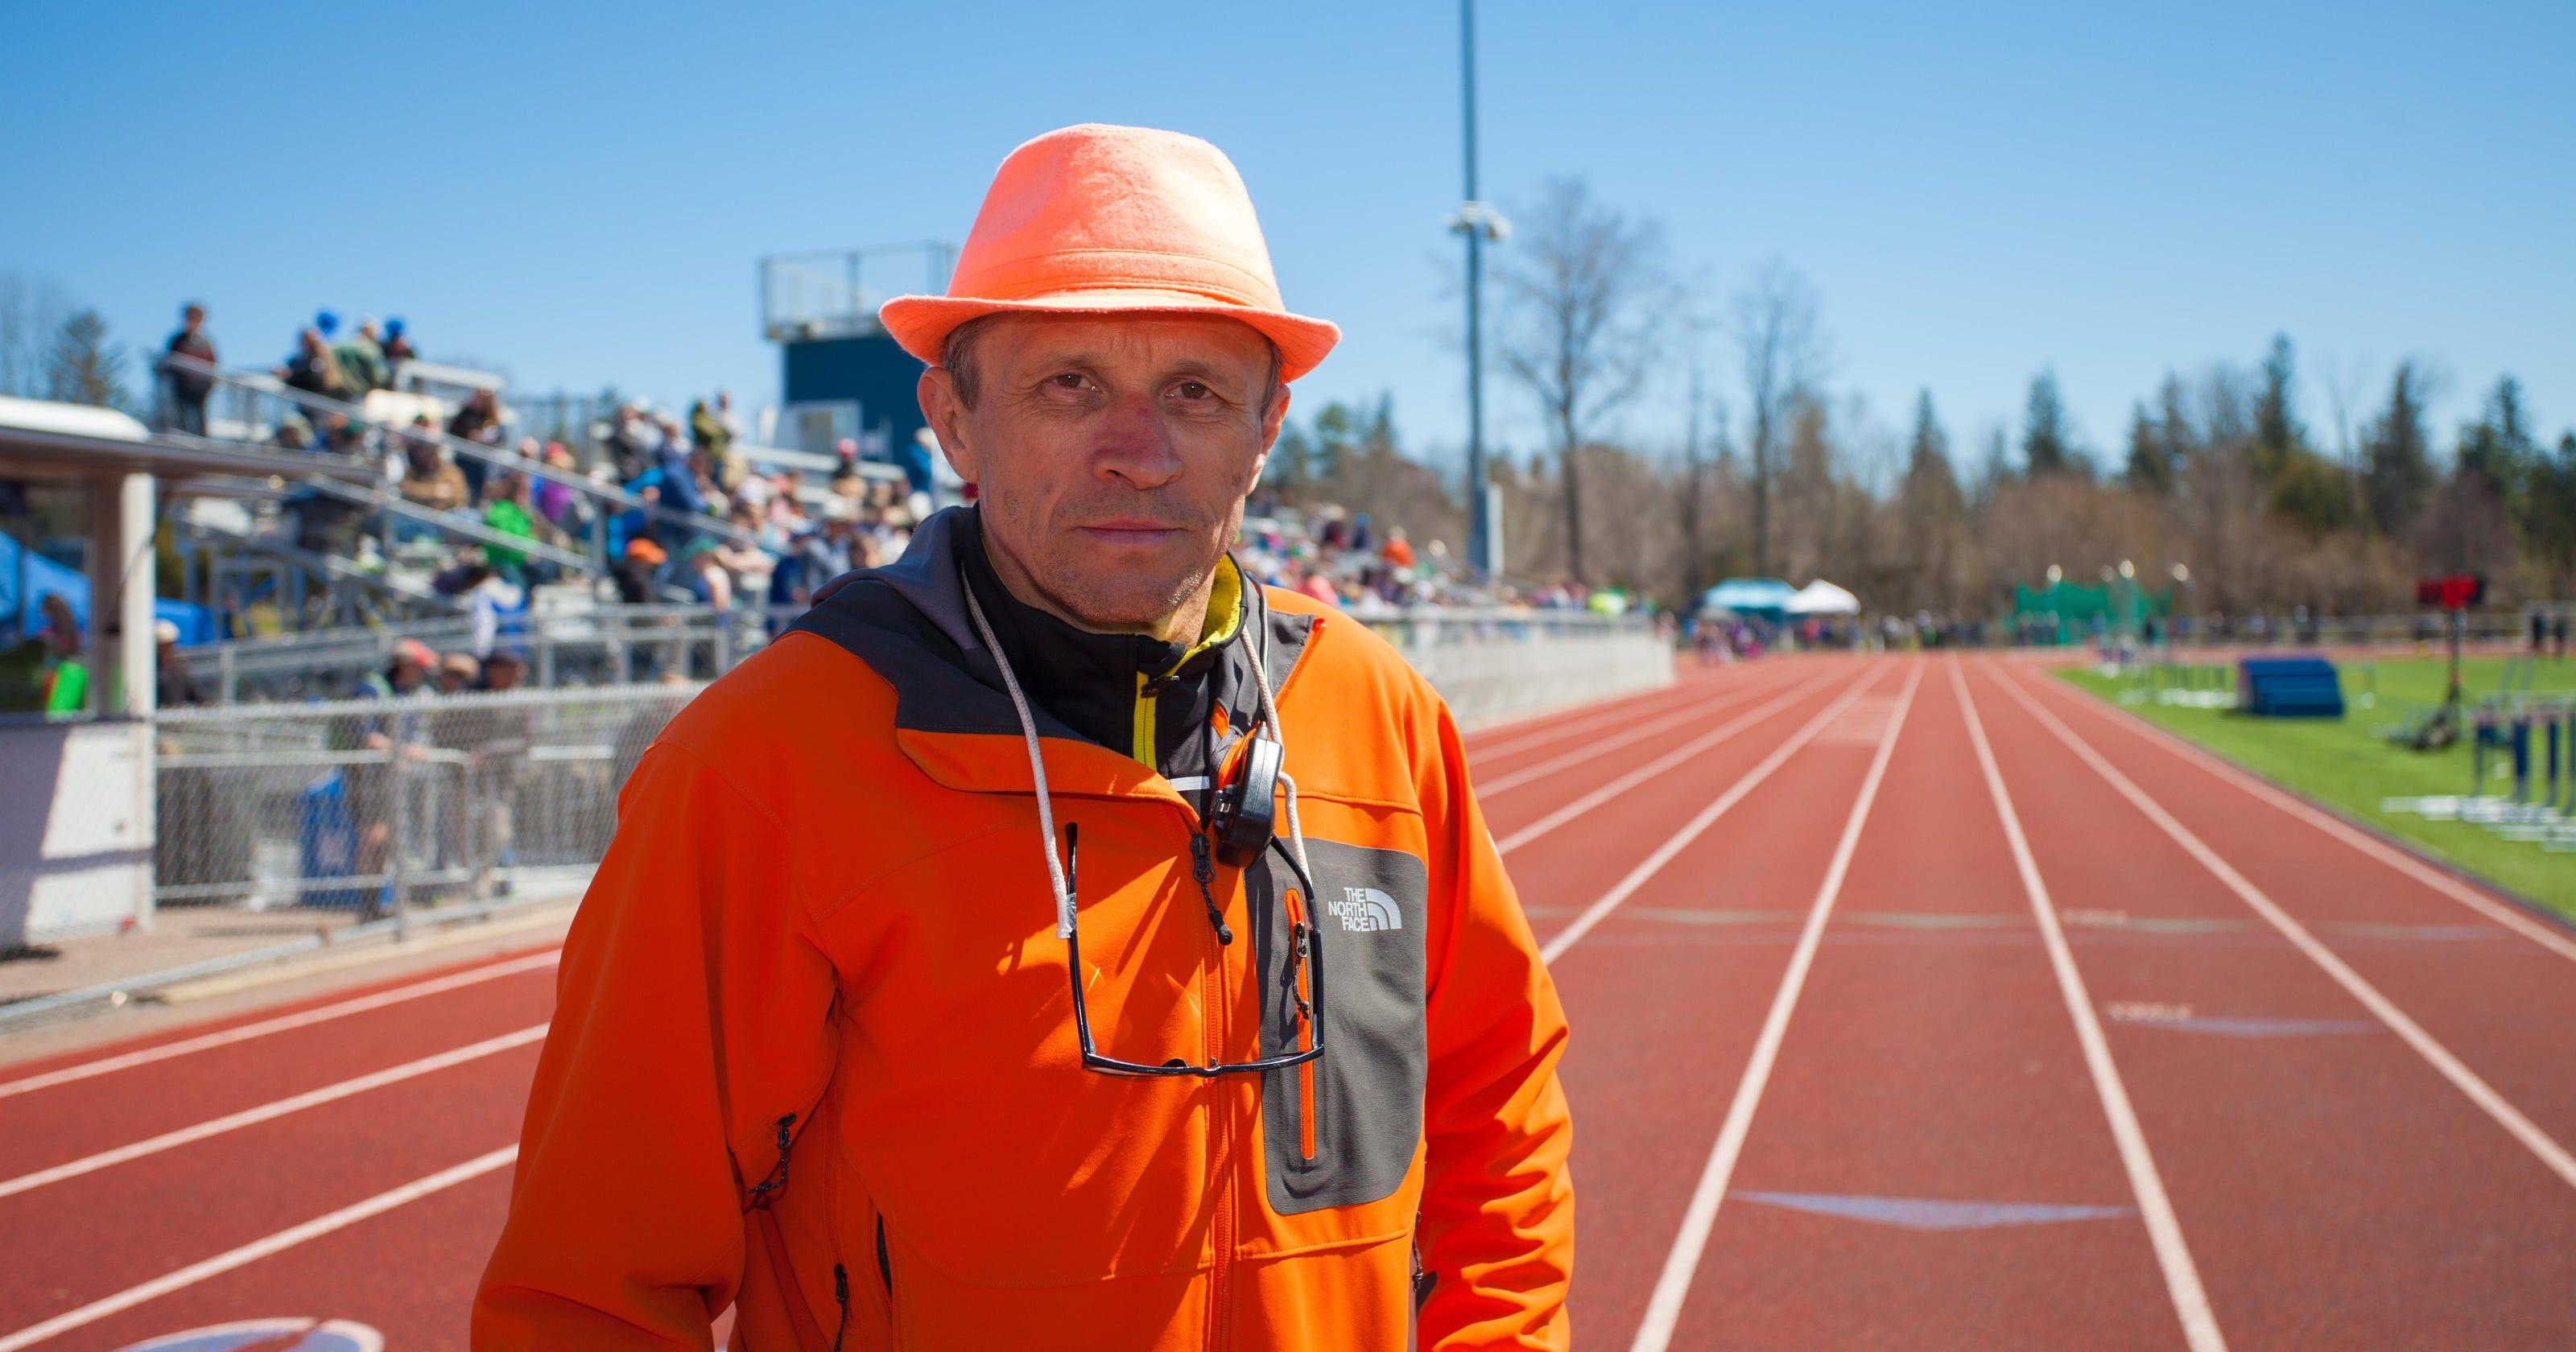 Track innovator Pavel Dvorak's incredible path to VT